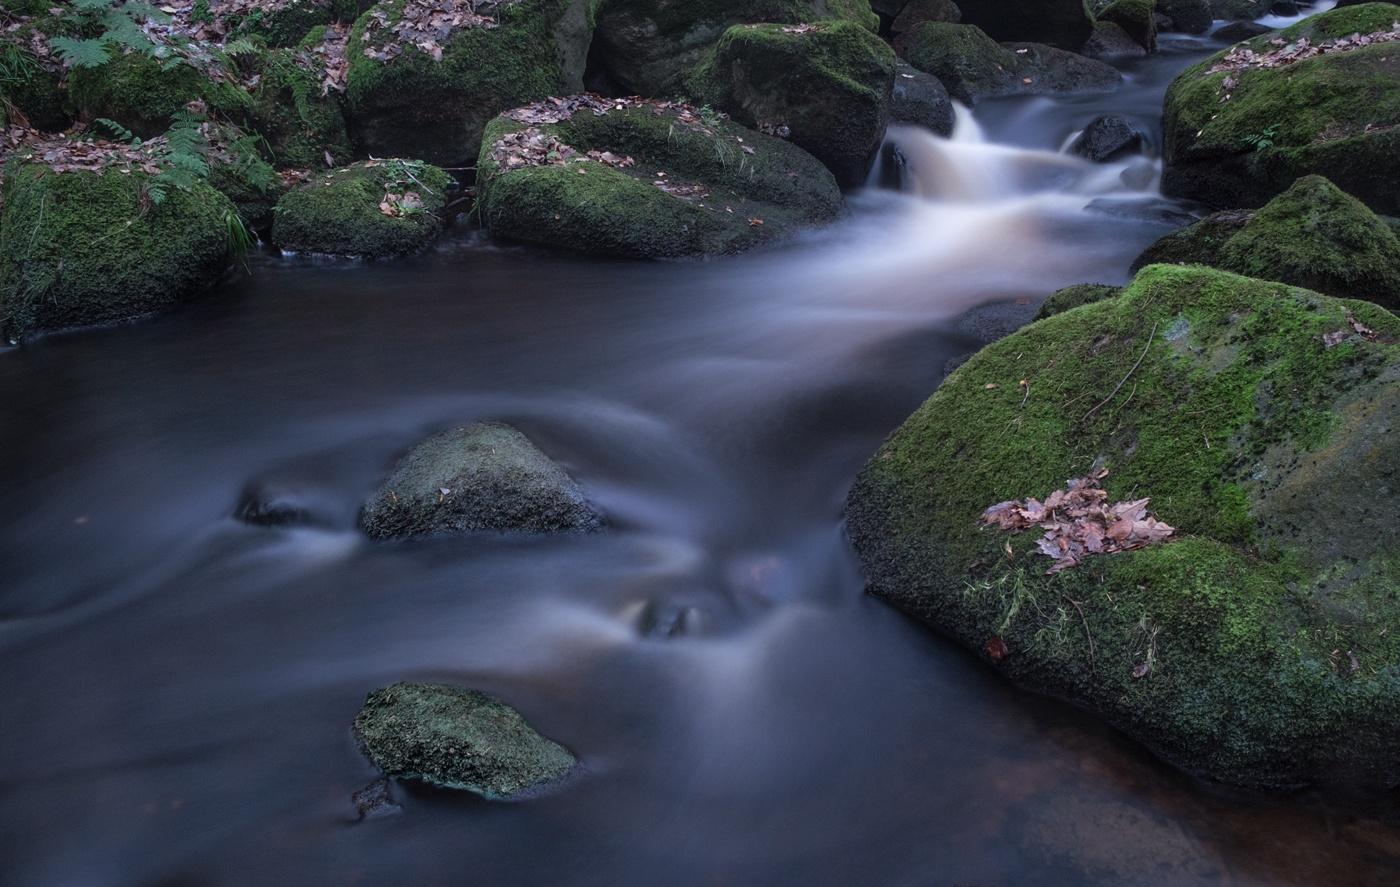 Milky Waters by PeteGajic